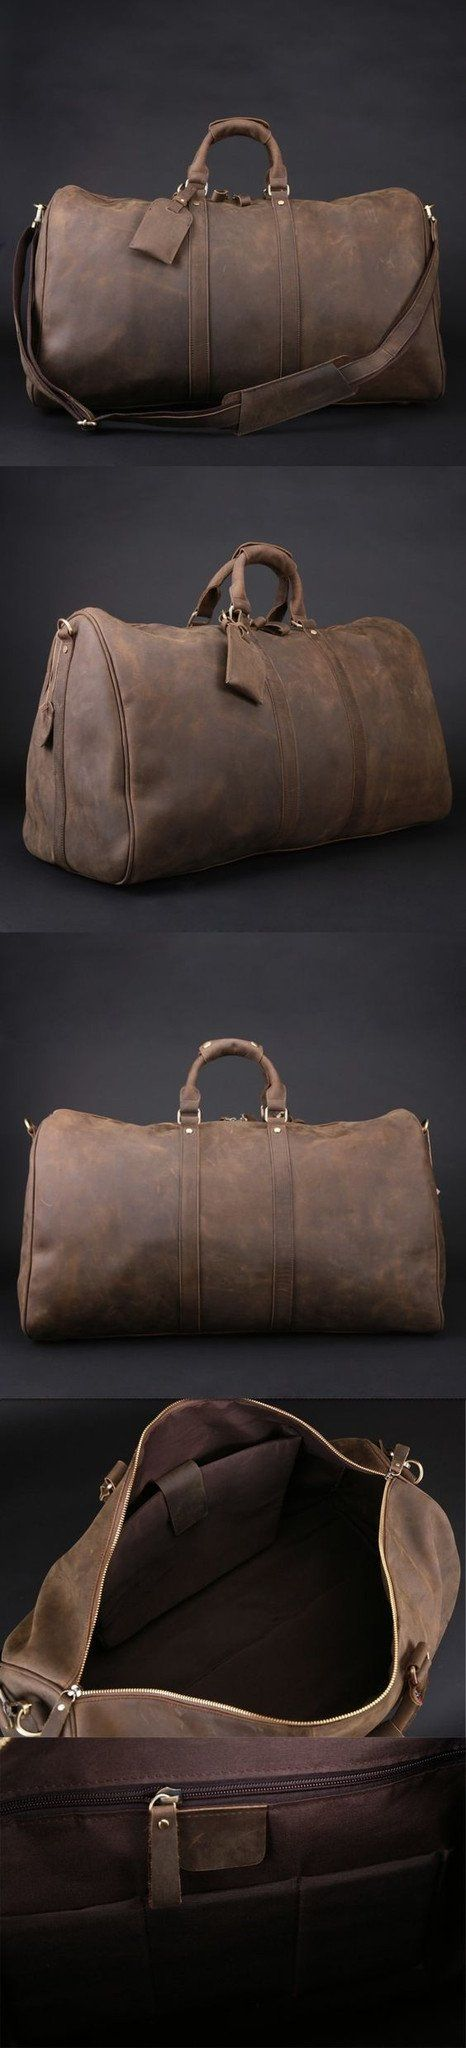 Men's Handmade Vintage Leather Duffle Bag / Travel Bag / Luggage / Gym Bag / Weekend Bag